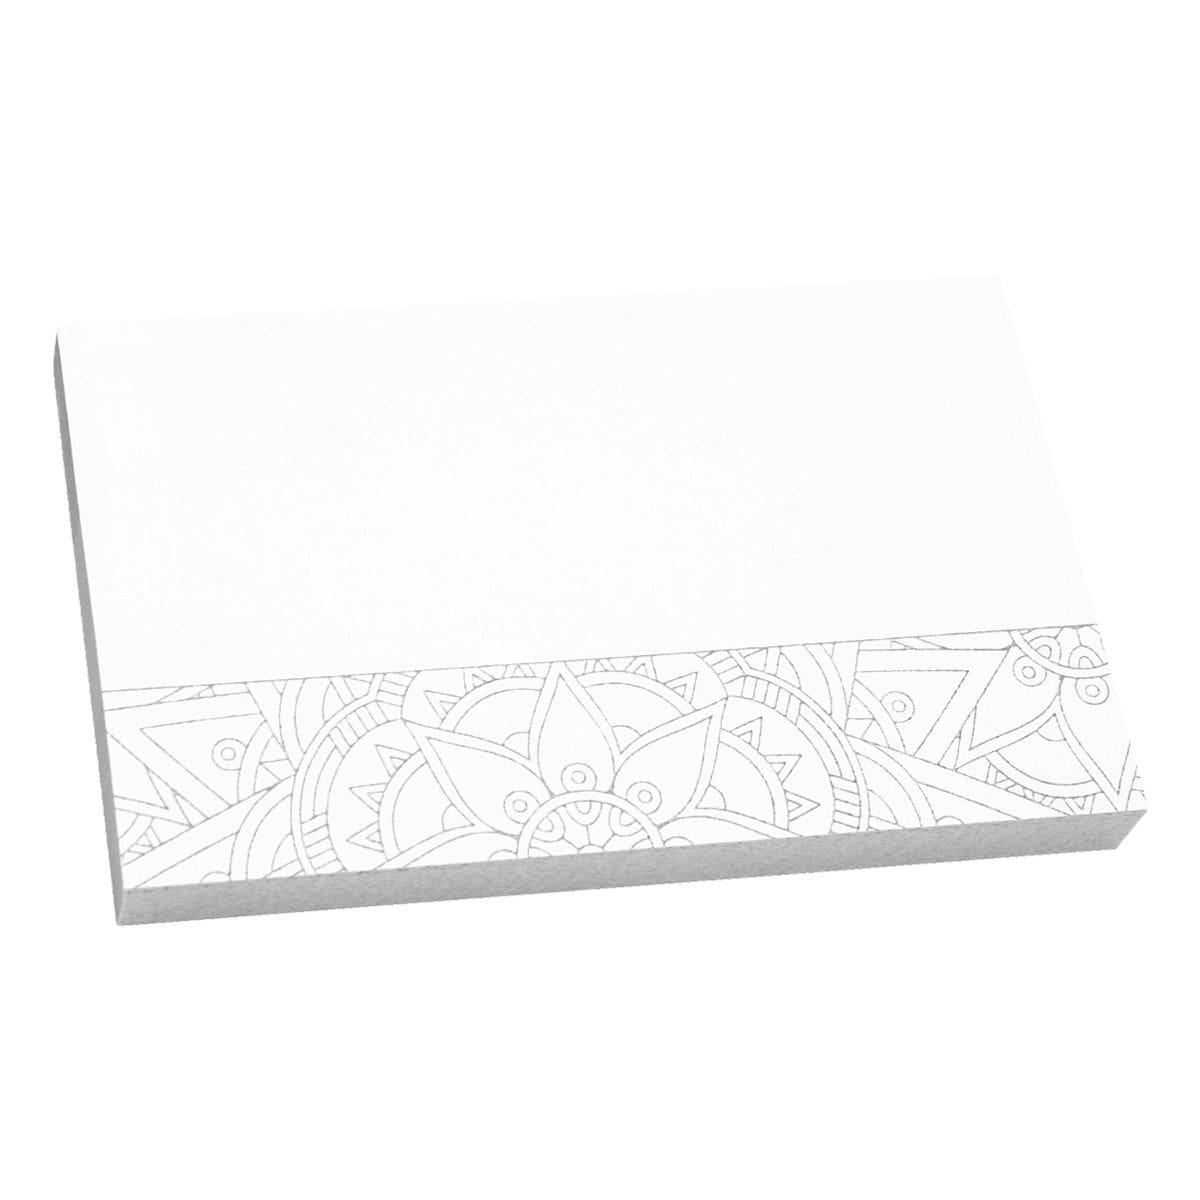 inFO Haftnotizblock Mandala 7,5 x 12,5 cm, 100 Blatt gesamt, weiß